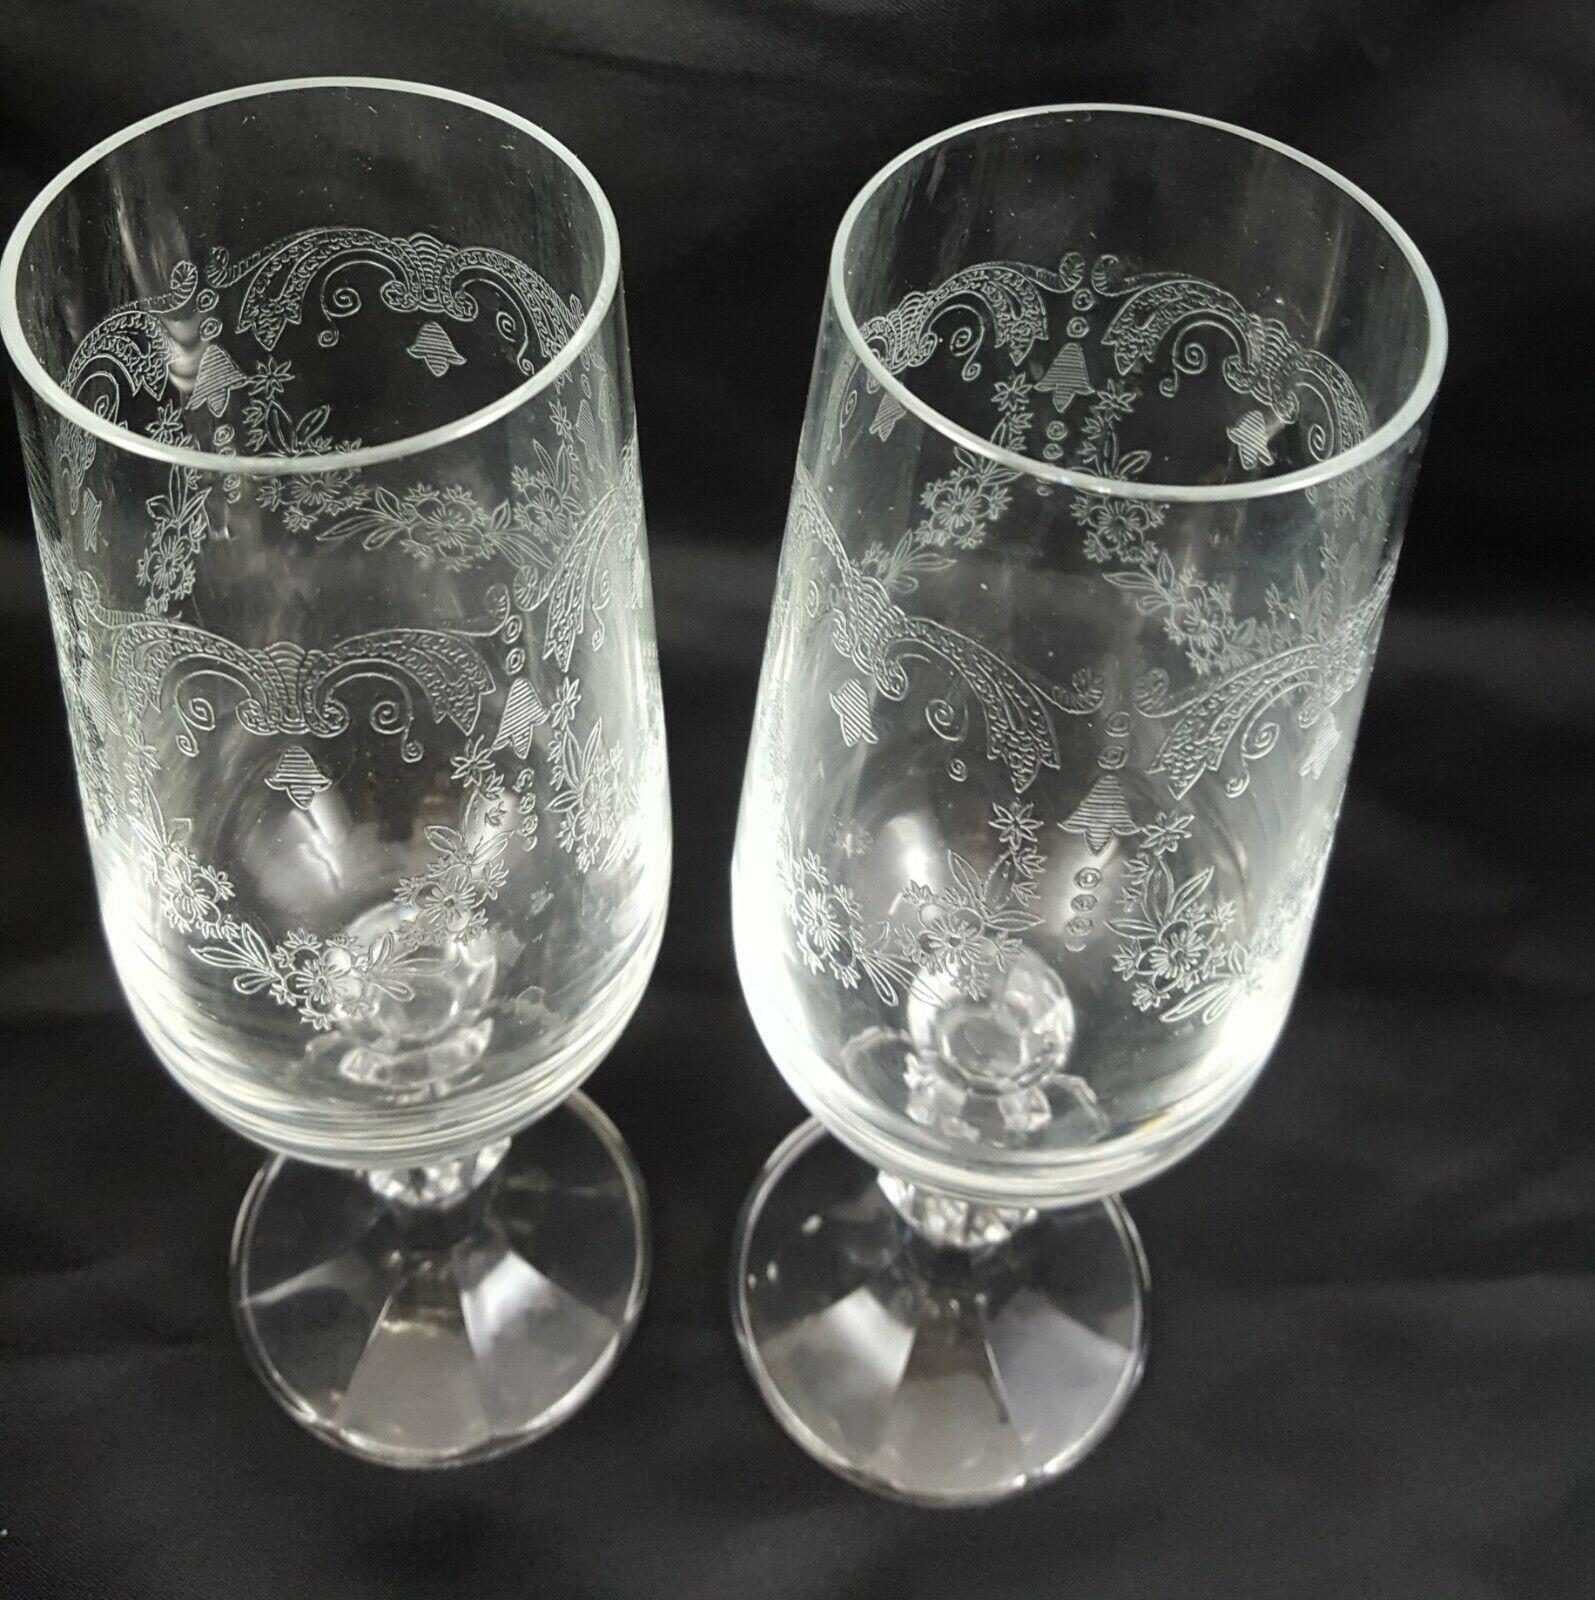 Crystalex Import Assoc Cascade Champagne Flutes Set of 2 Czech Crystal 6 oz image 8